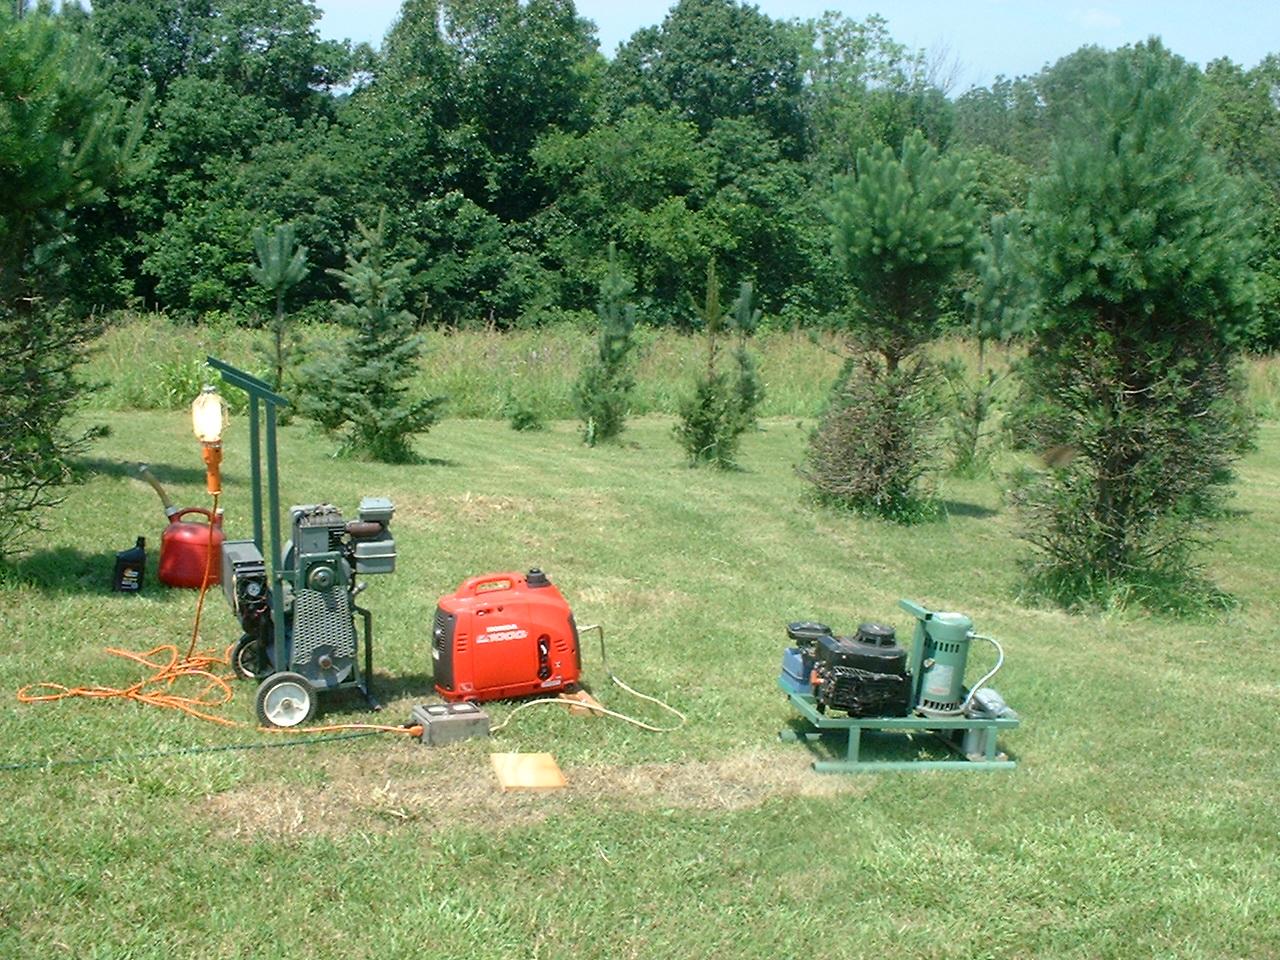 ns8o s homebrew generators and n8xwo s honda